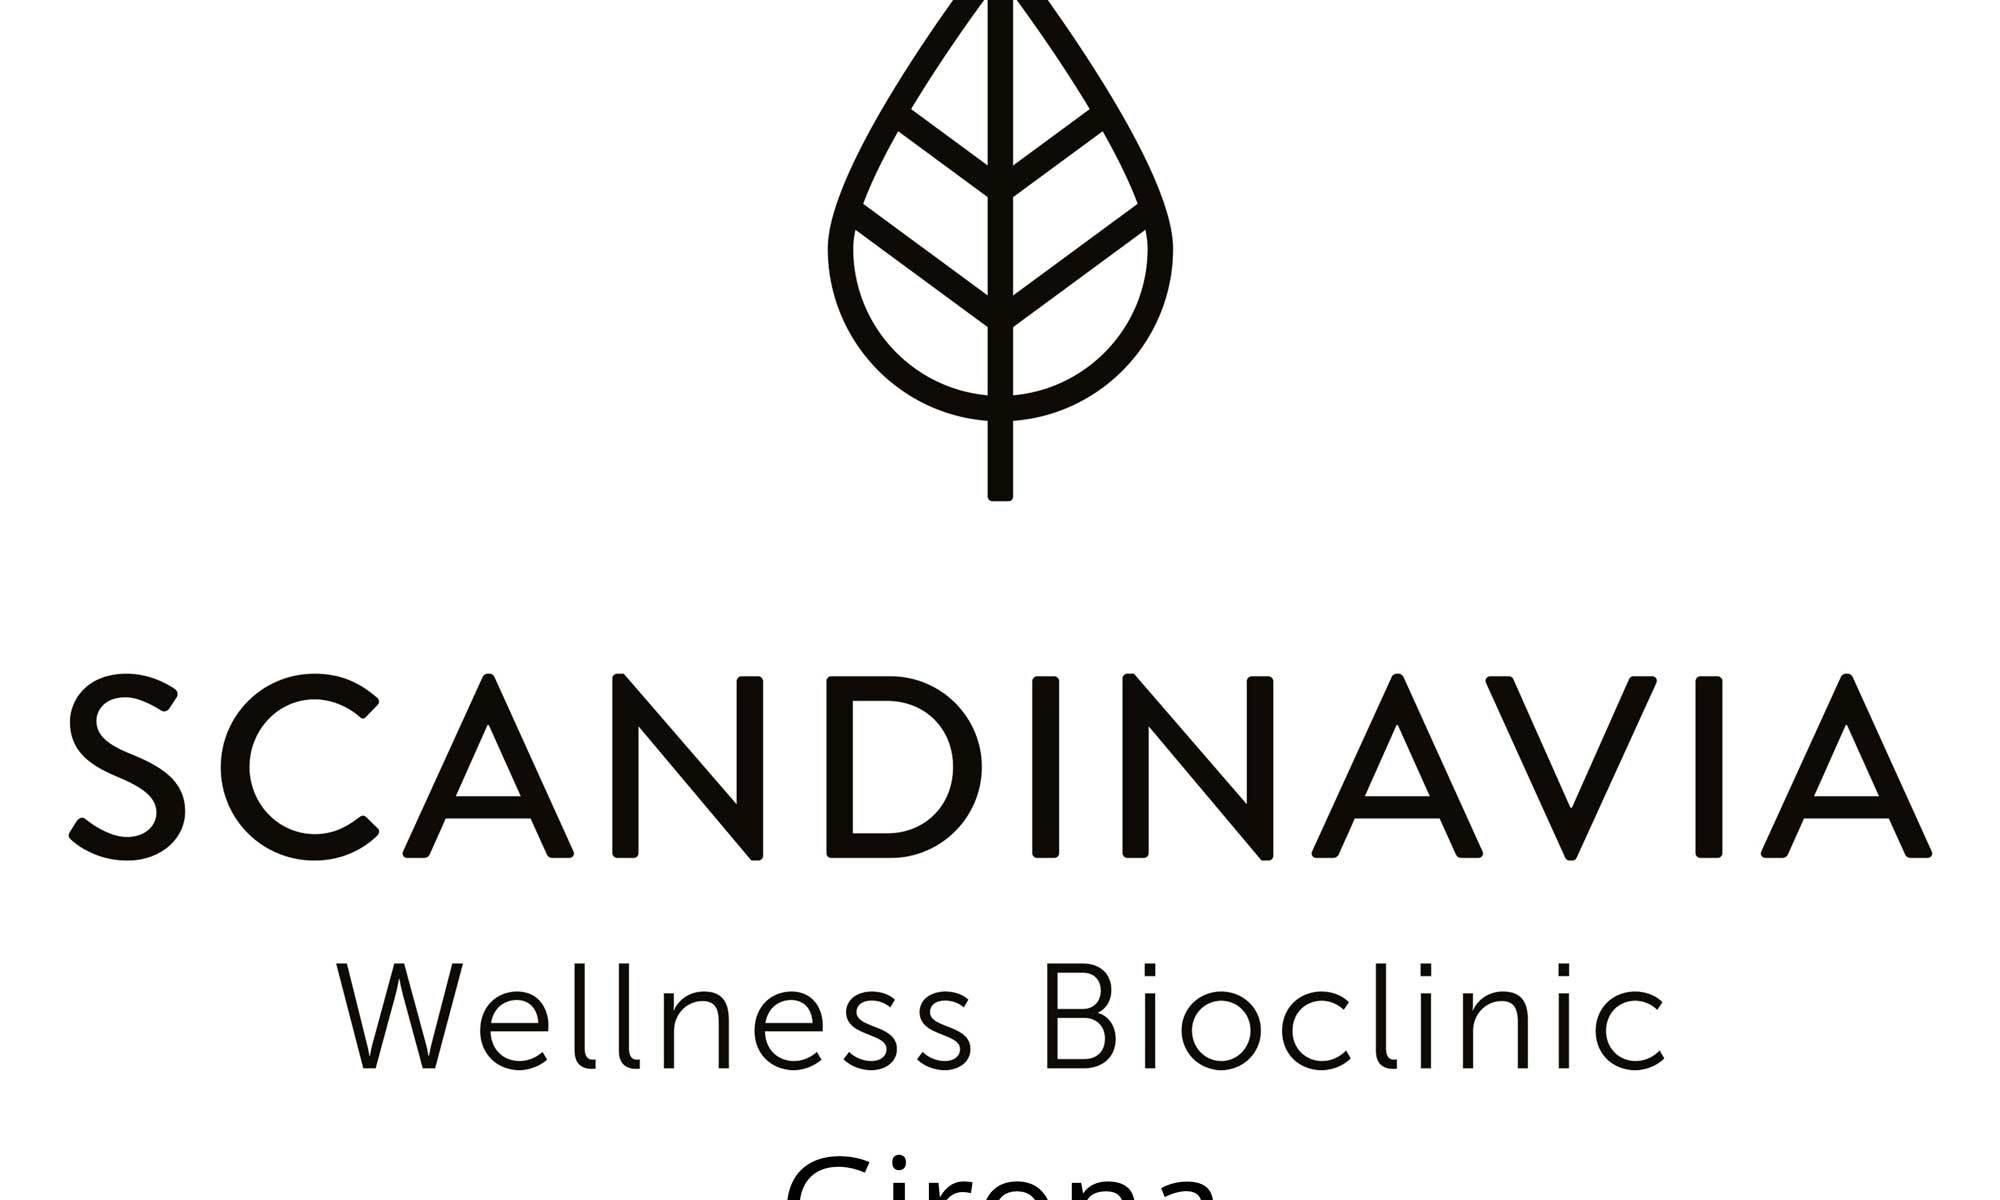 Scandinavia Wellness Bioclinic - Girona